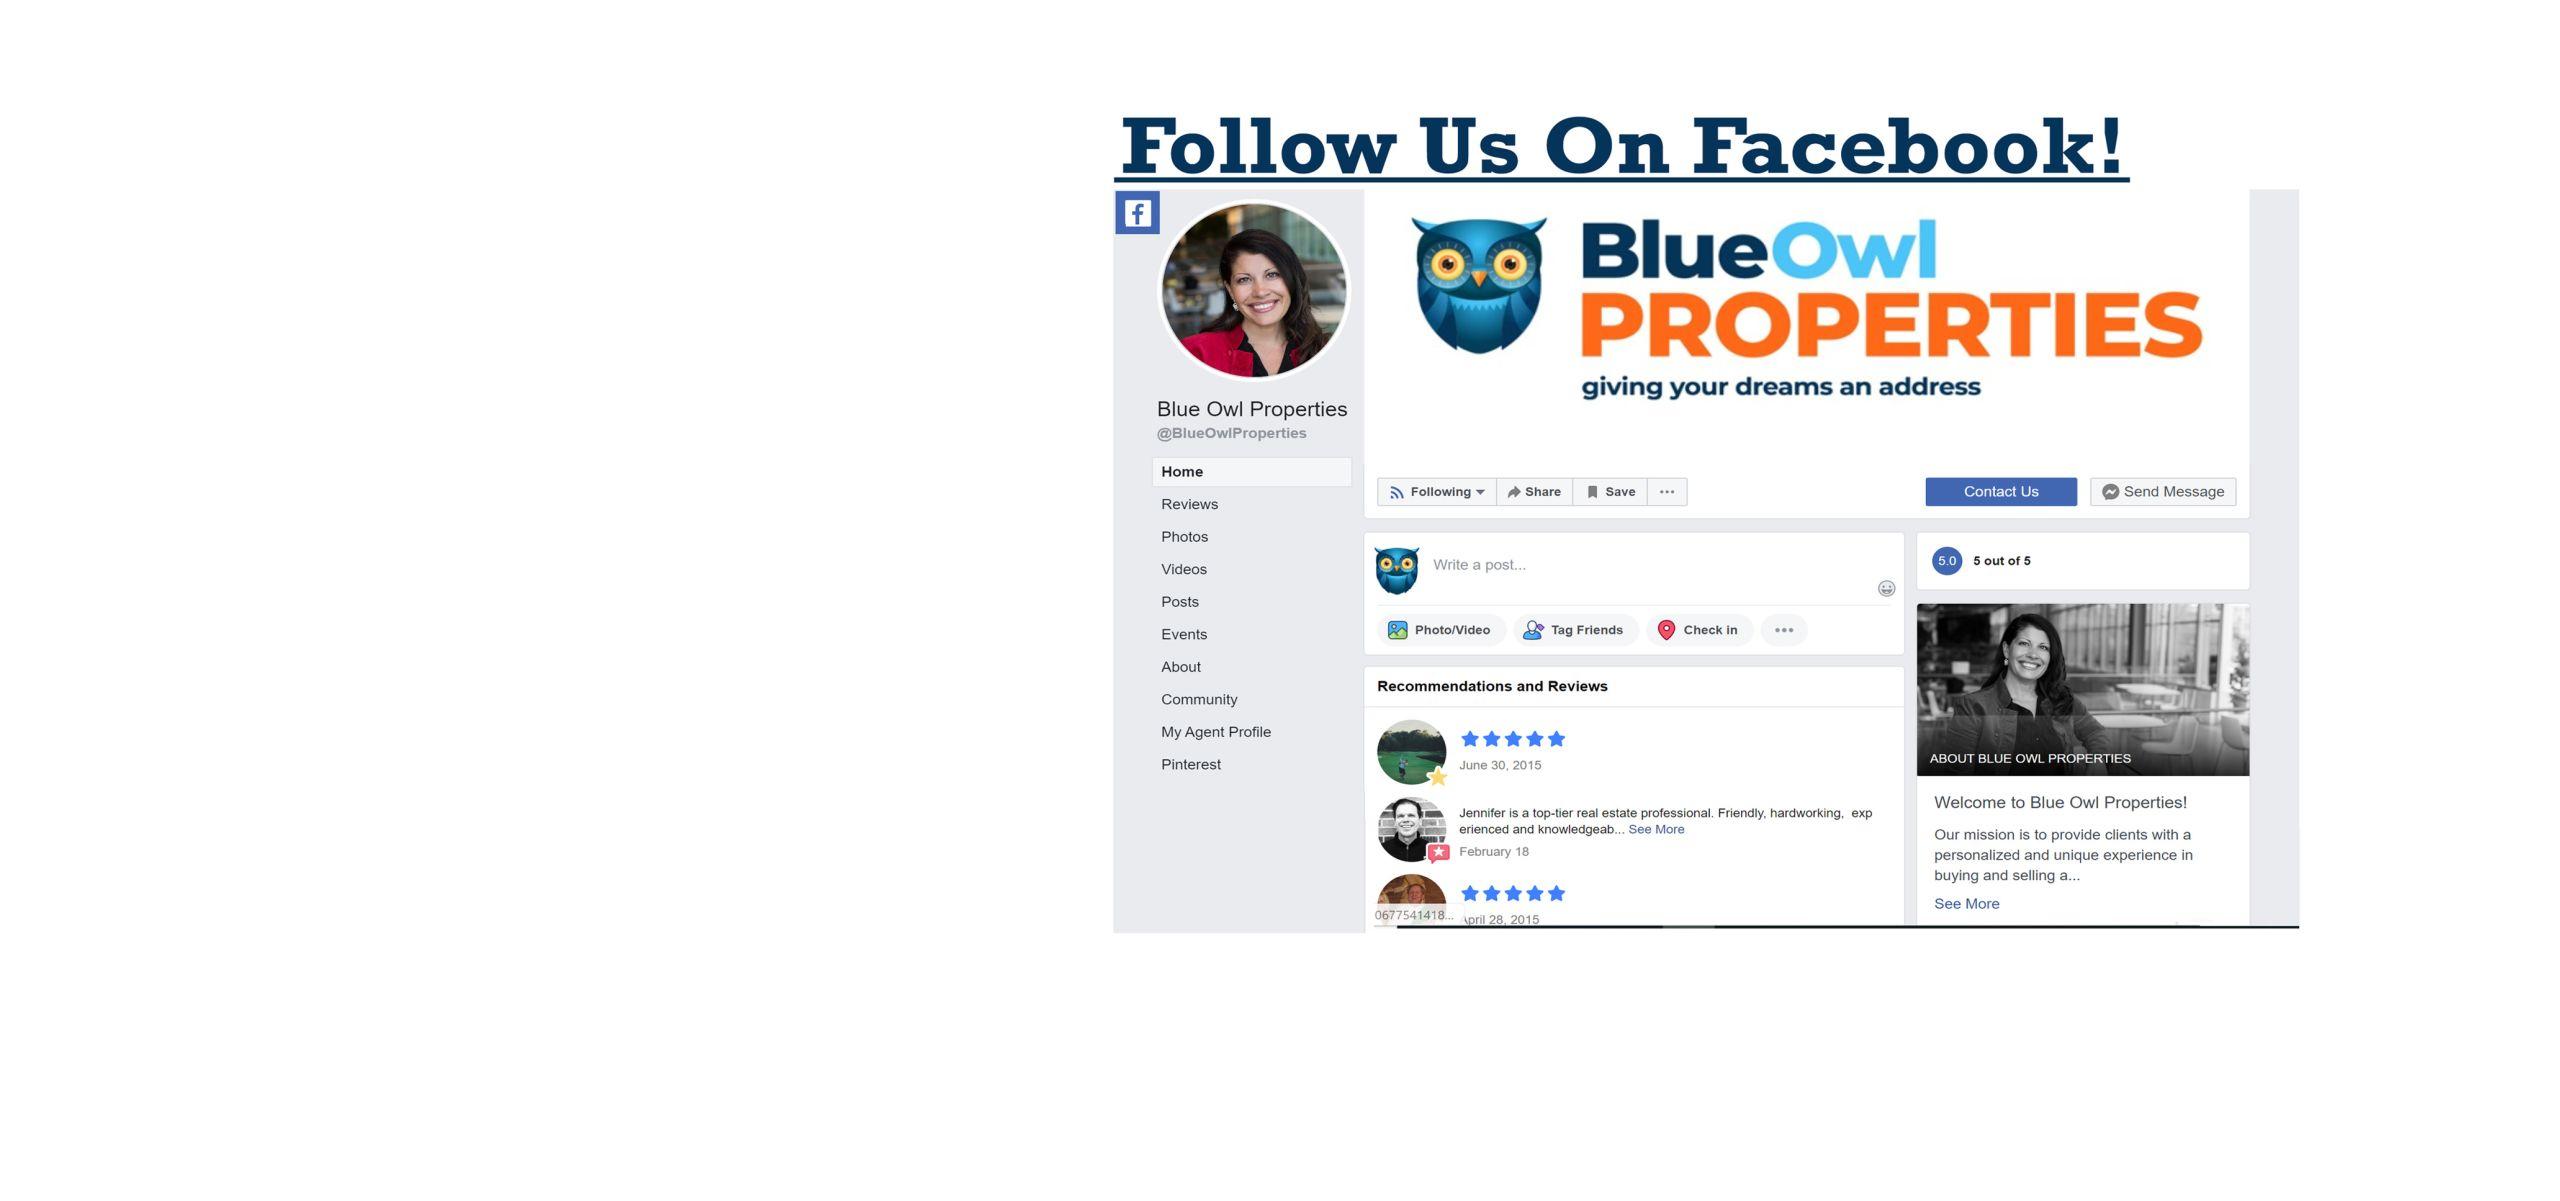 Find Our Facebook